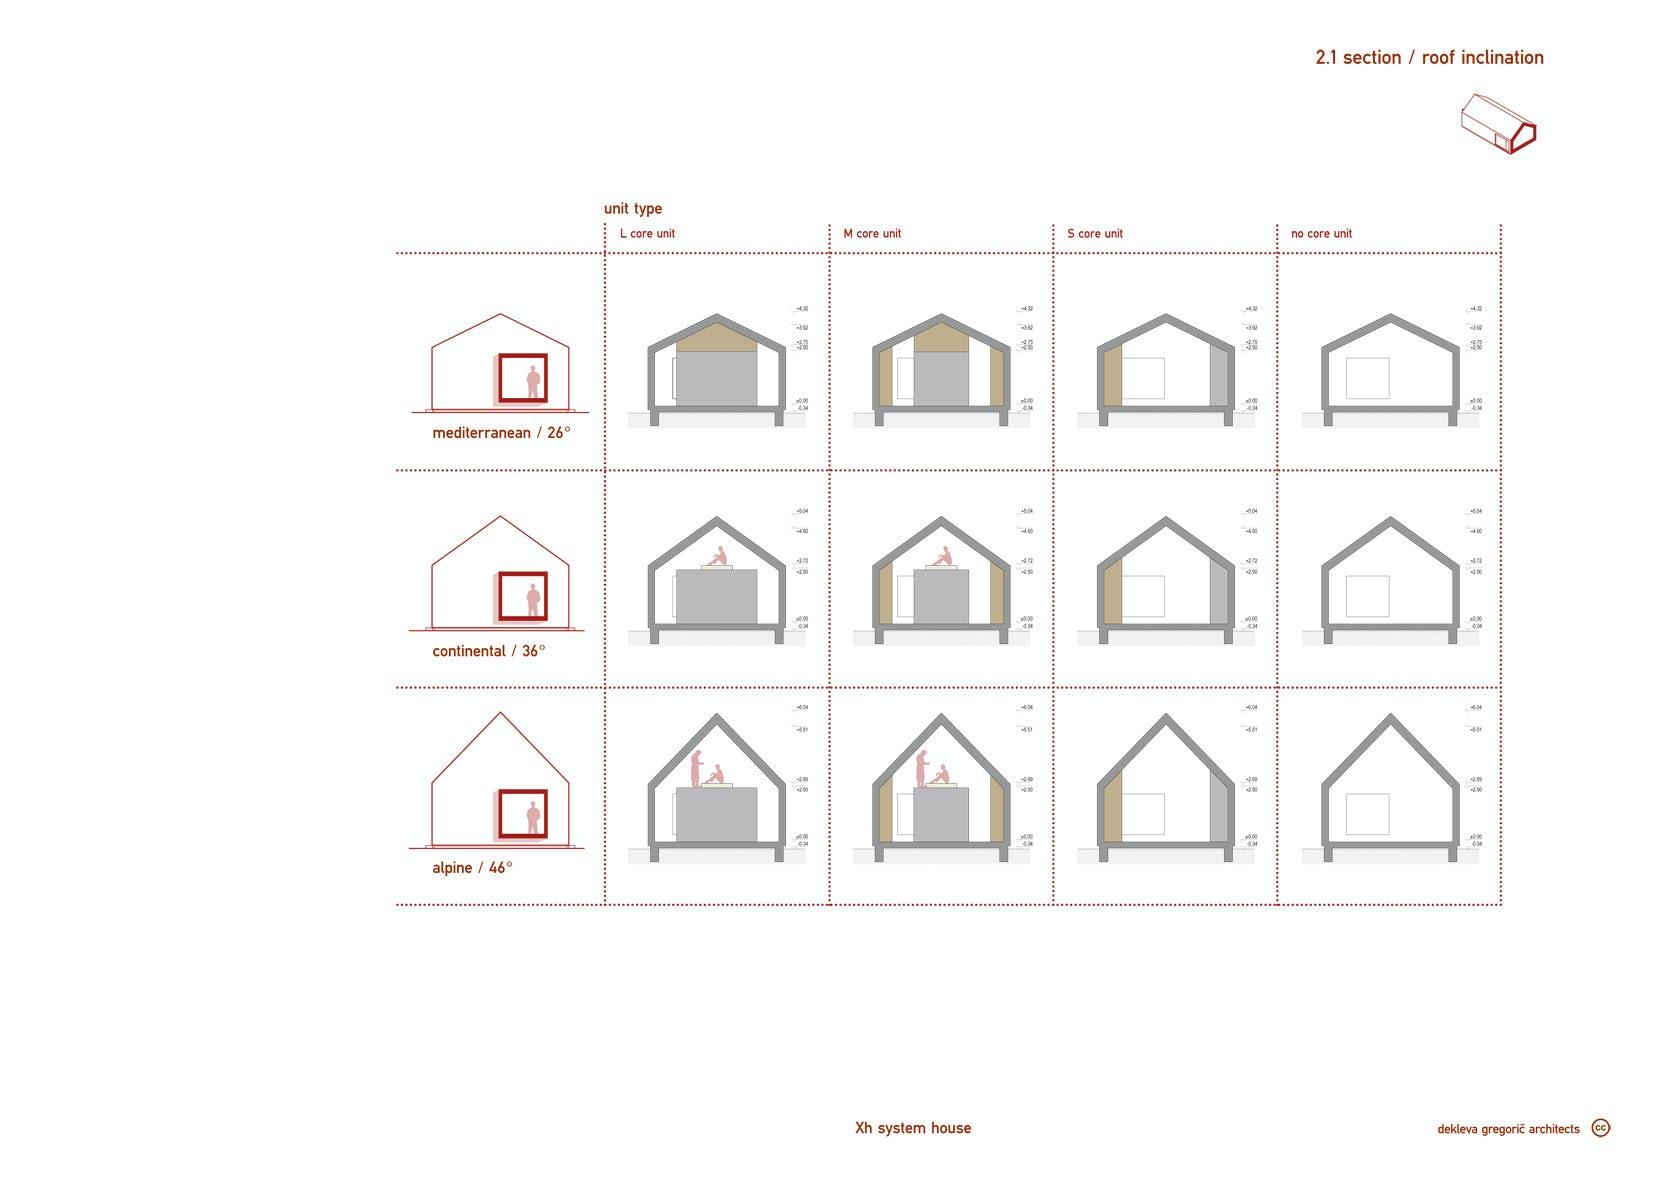 Xh system house on Architizer